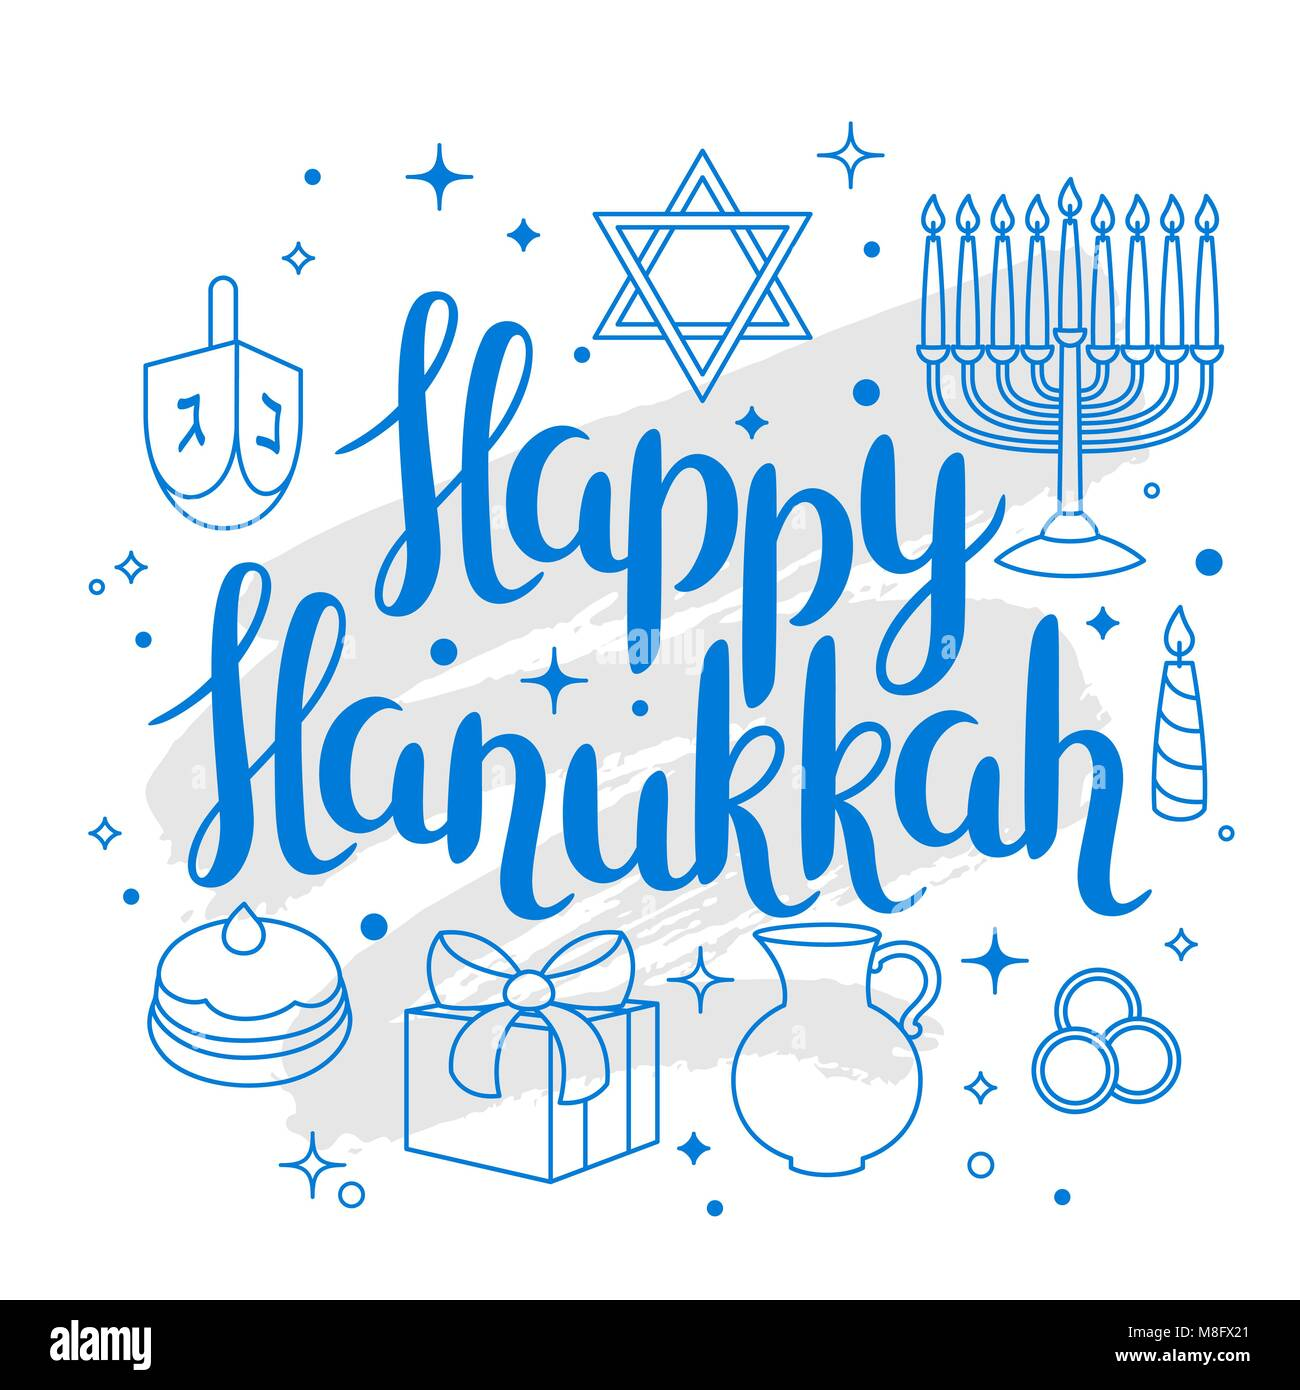 Happy Hanukkah celebration card with holiday objects - Stock Image